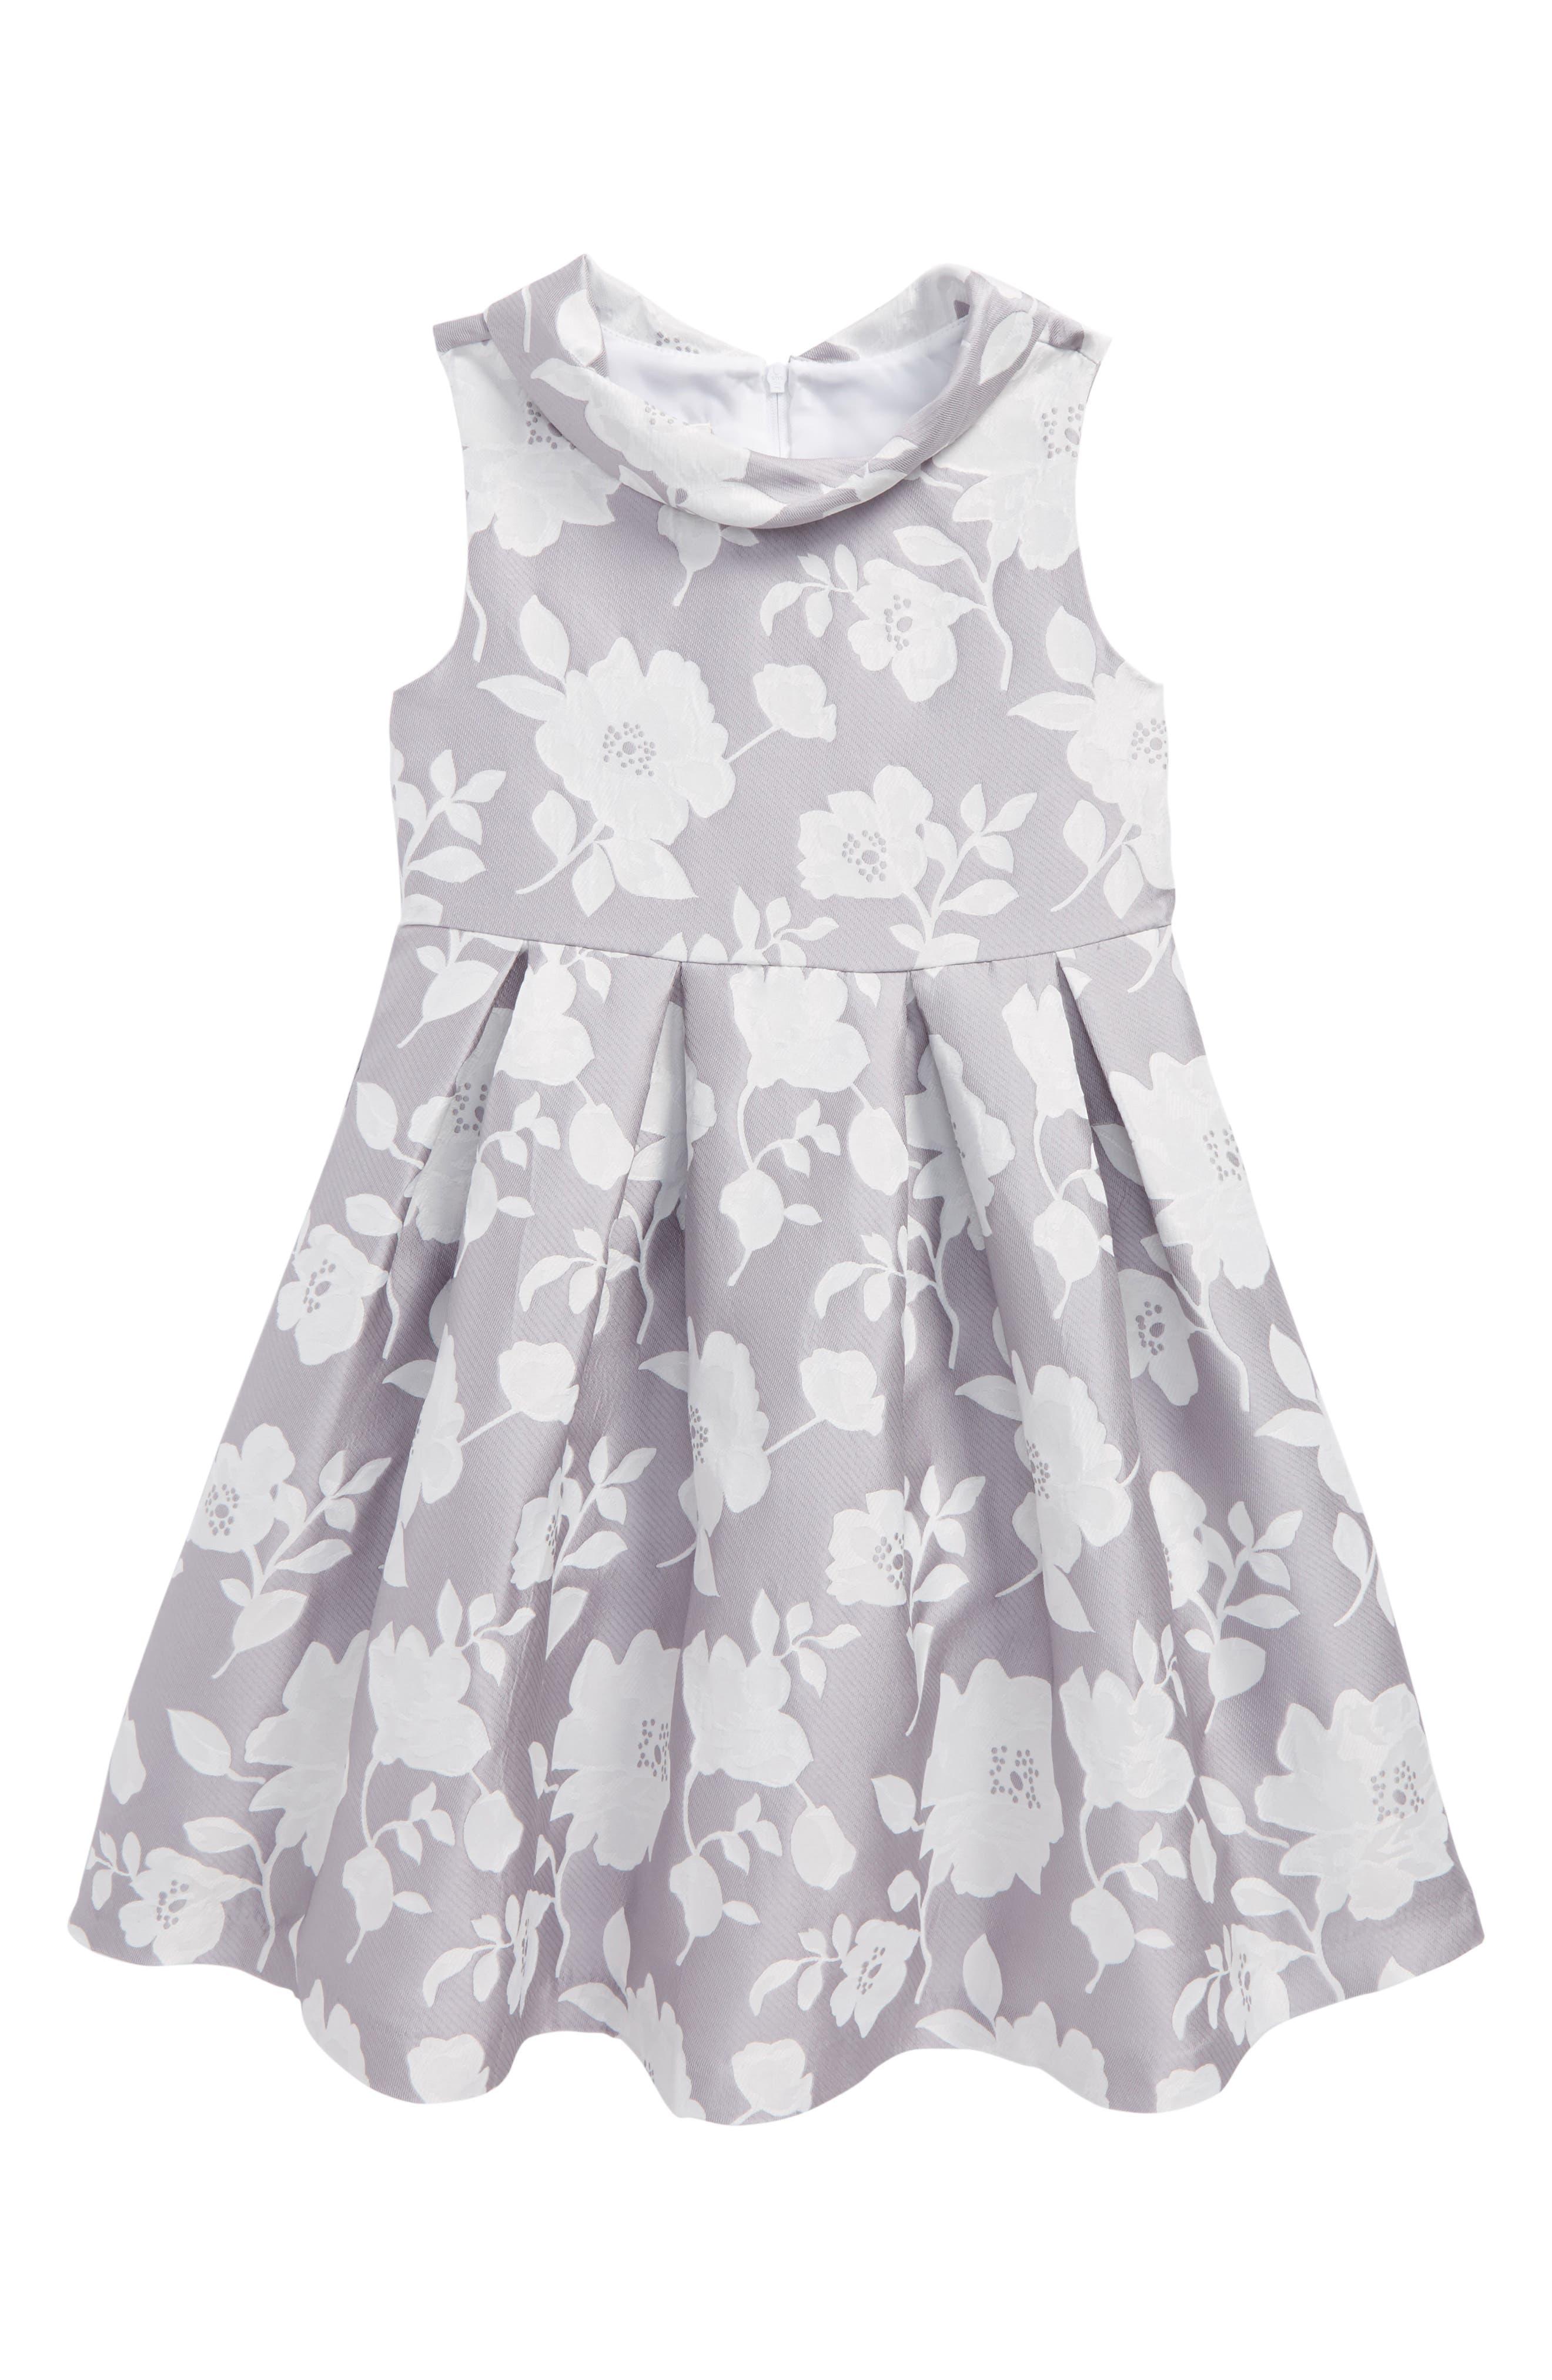 Floral Jacquard Dress,                             Main thumbnail 1, color,                             020